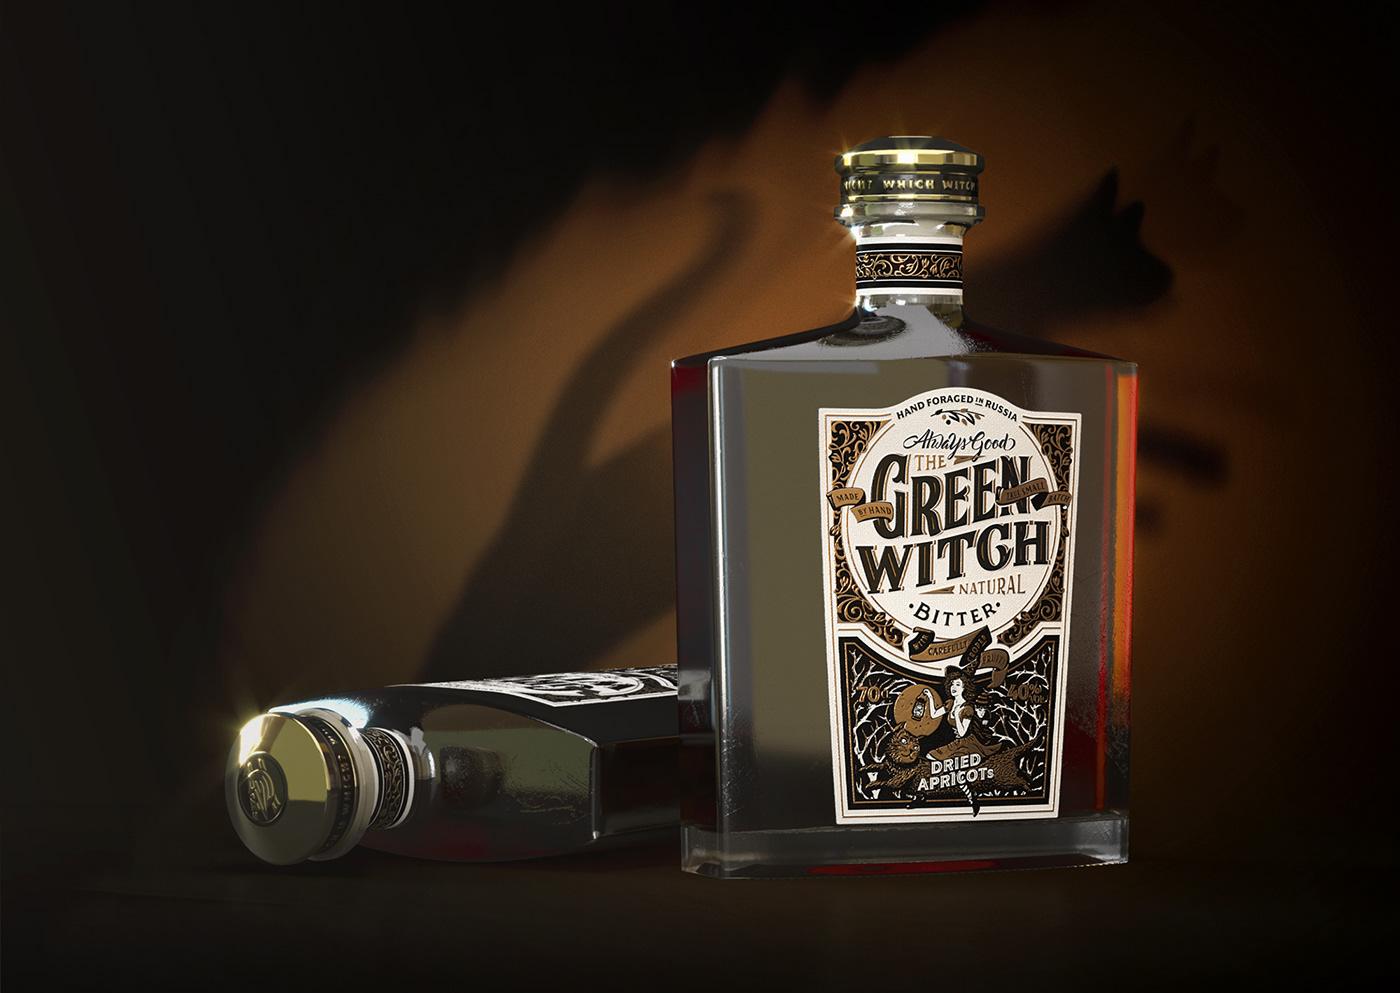 green witch bitter bottle natural Spirits drink handmade lettering